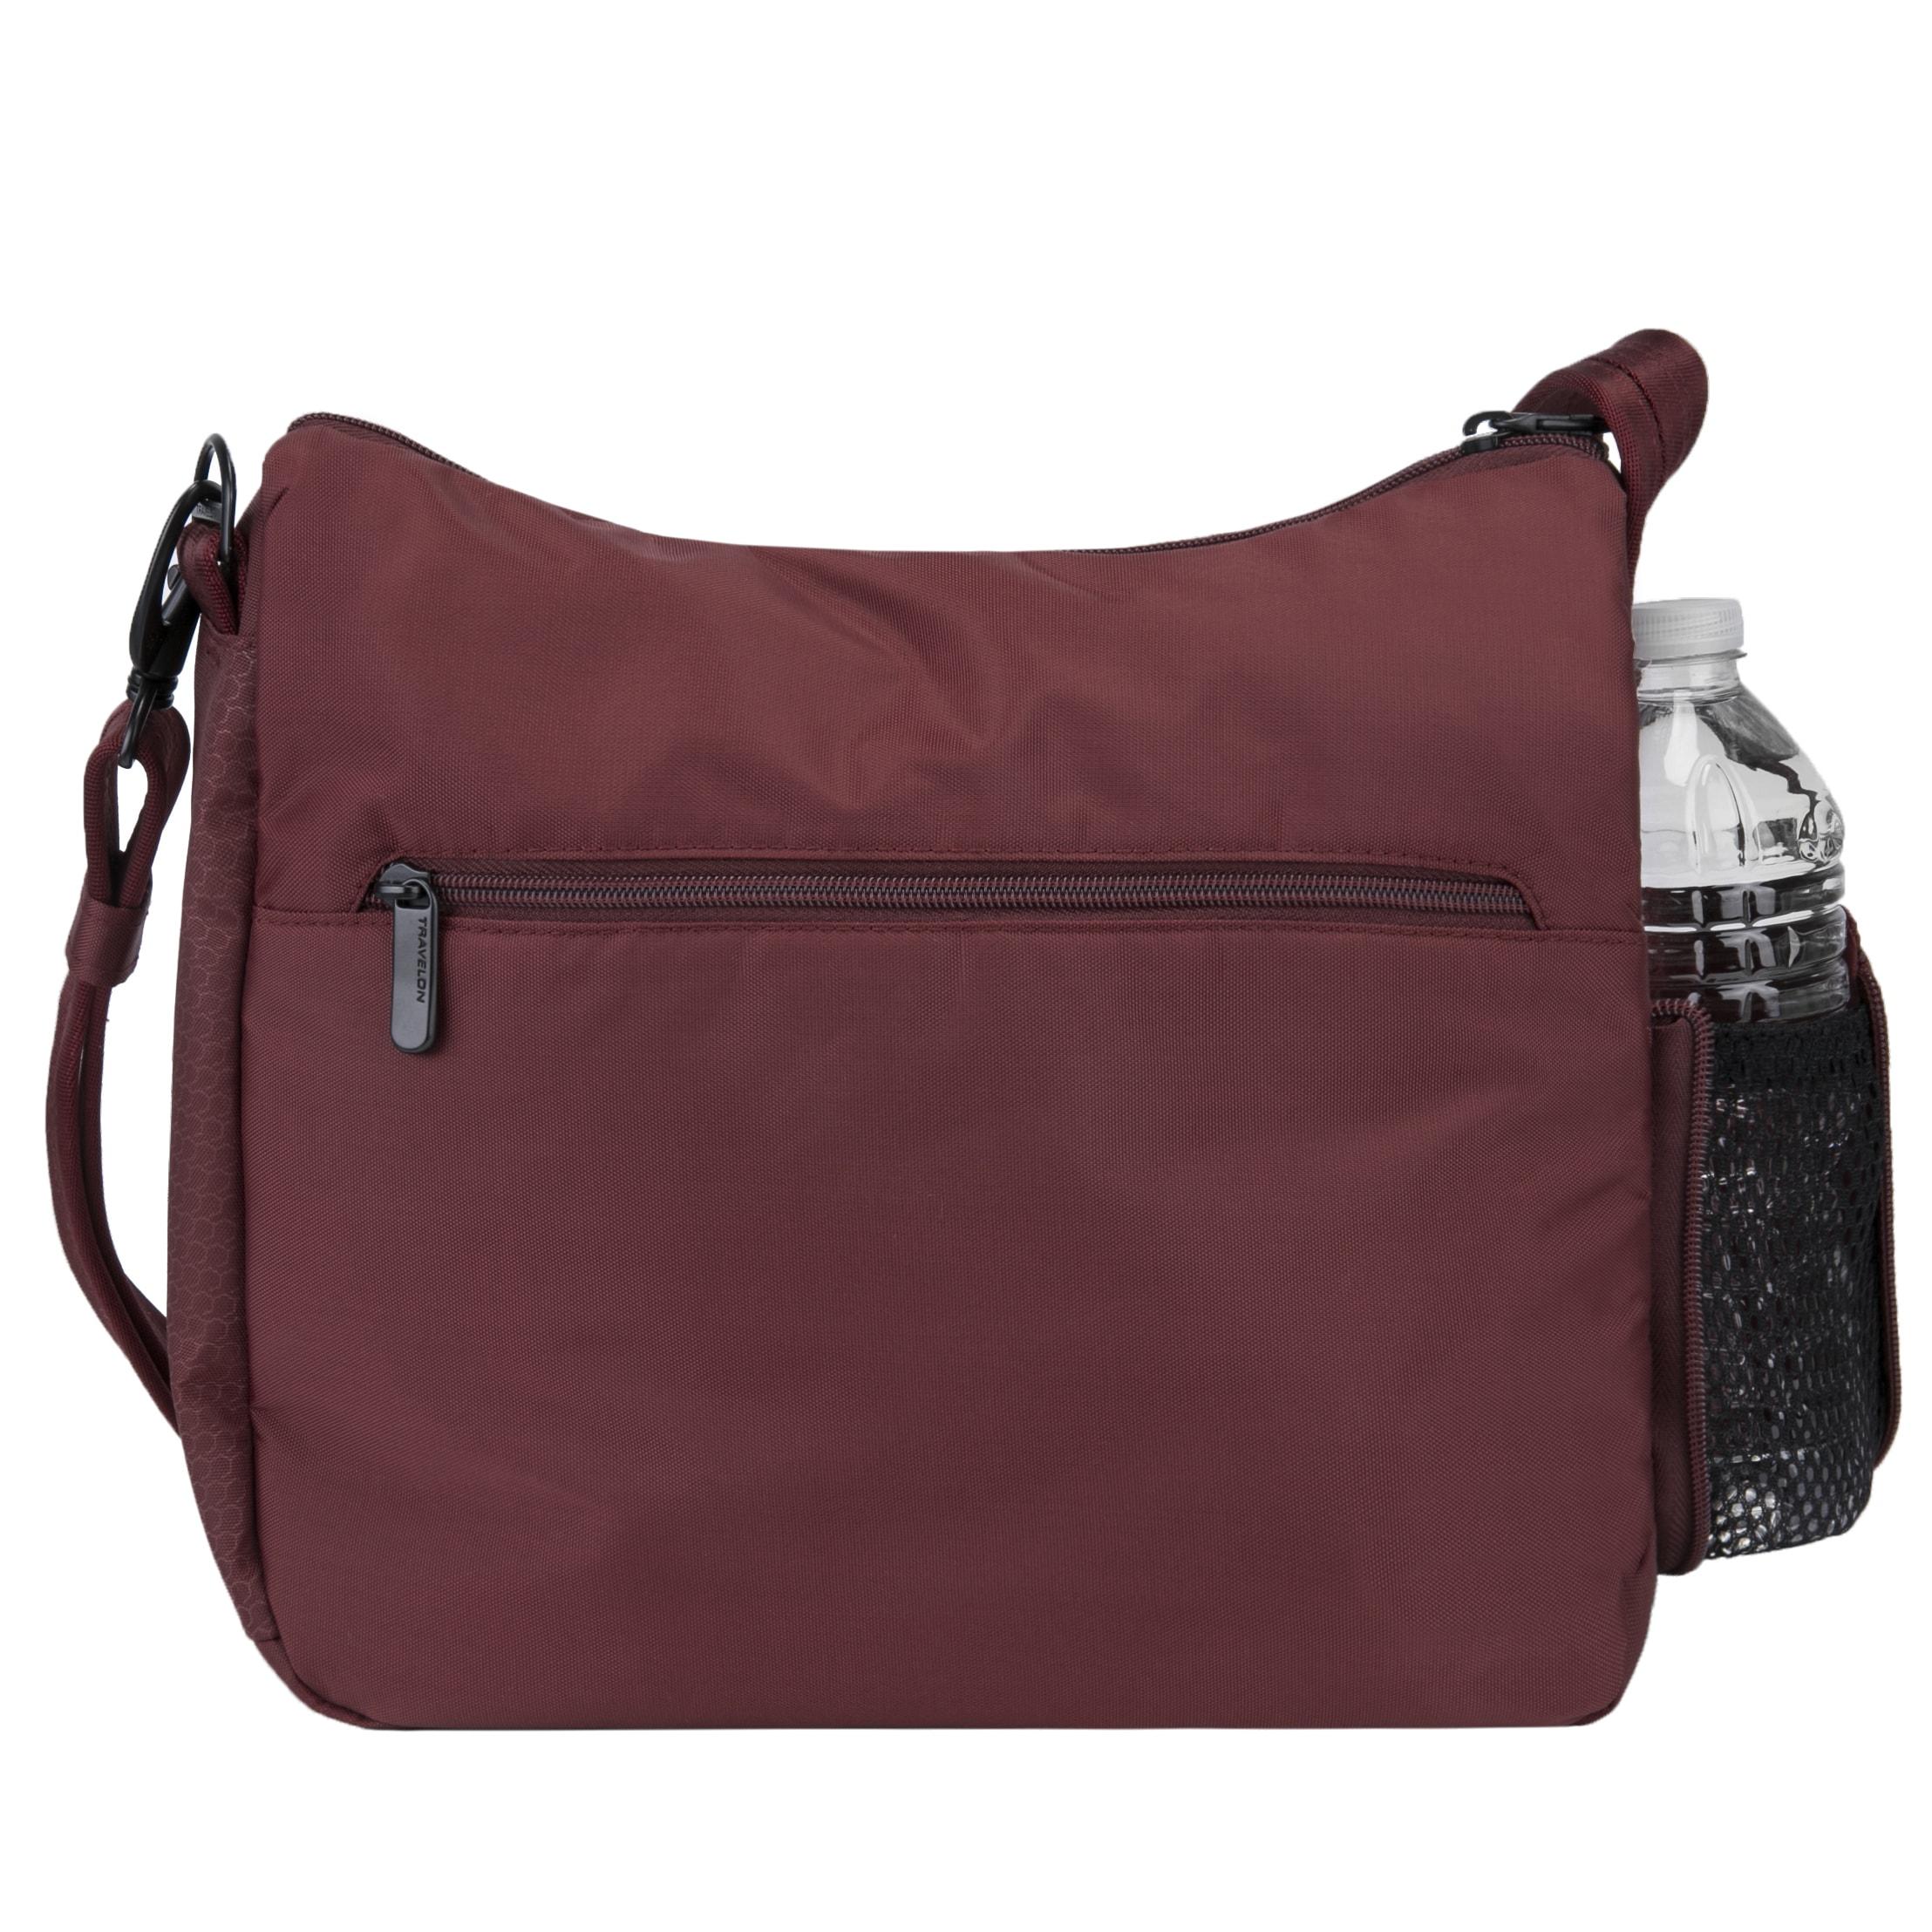 5aef7196ae33 Shop Travelon Anti-Theft Active Medium Crossbody Bag - Free Shipping Today  - Overstock - 15614287